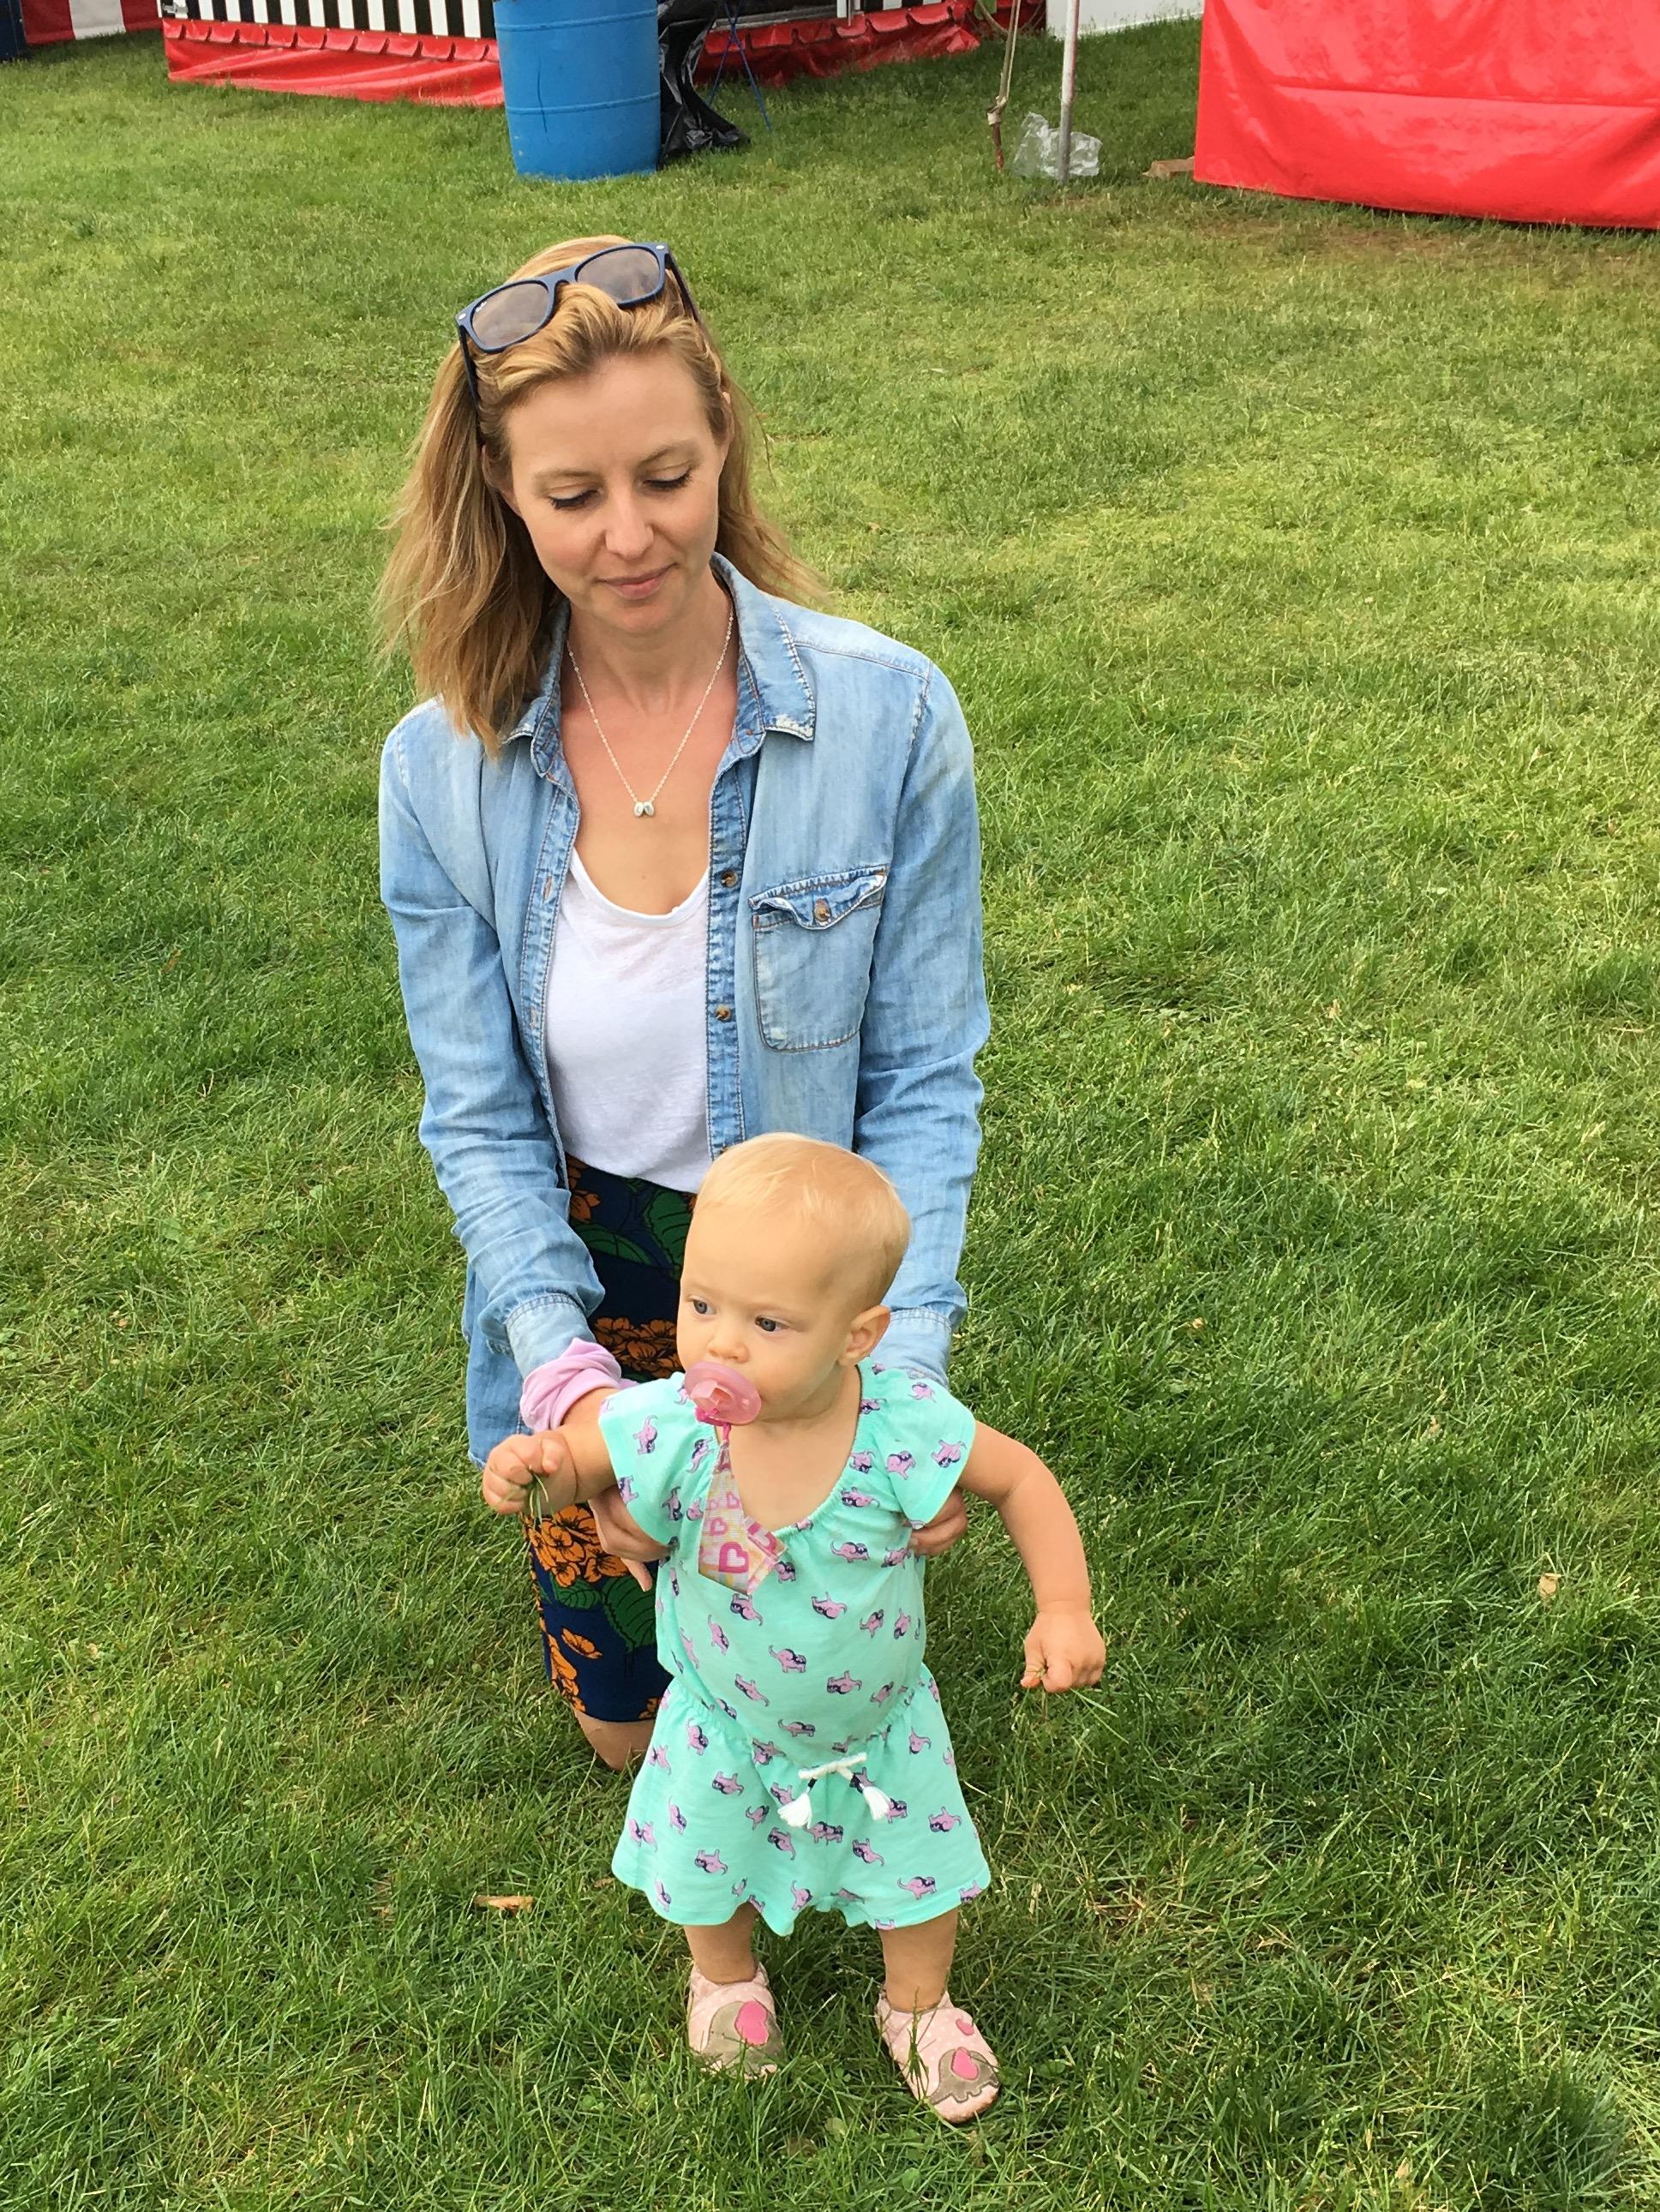 family time Woodstock-New Paltz Art & Crafts Fair children